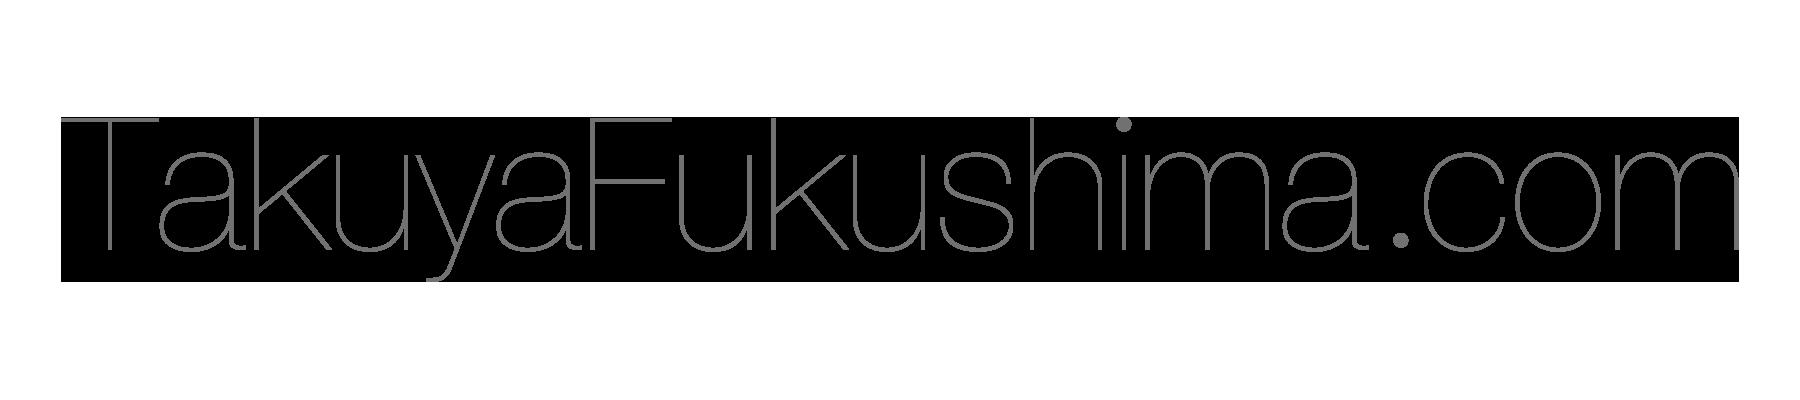 TakuyaFukushima.com